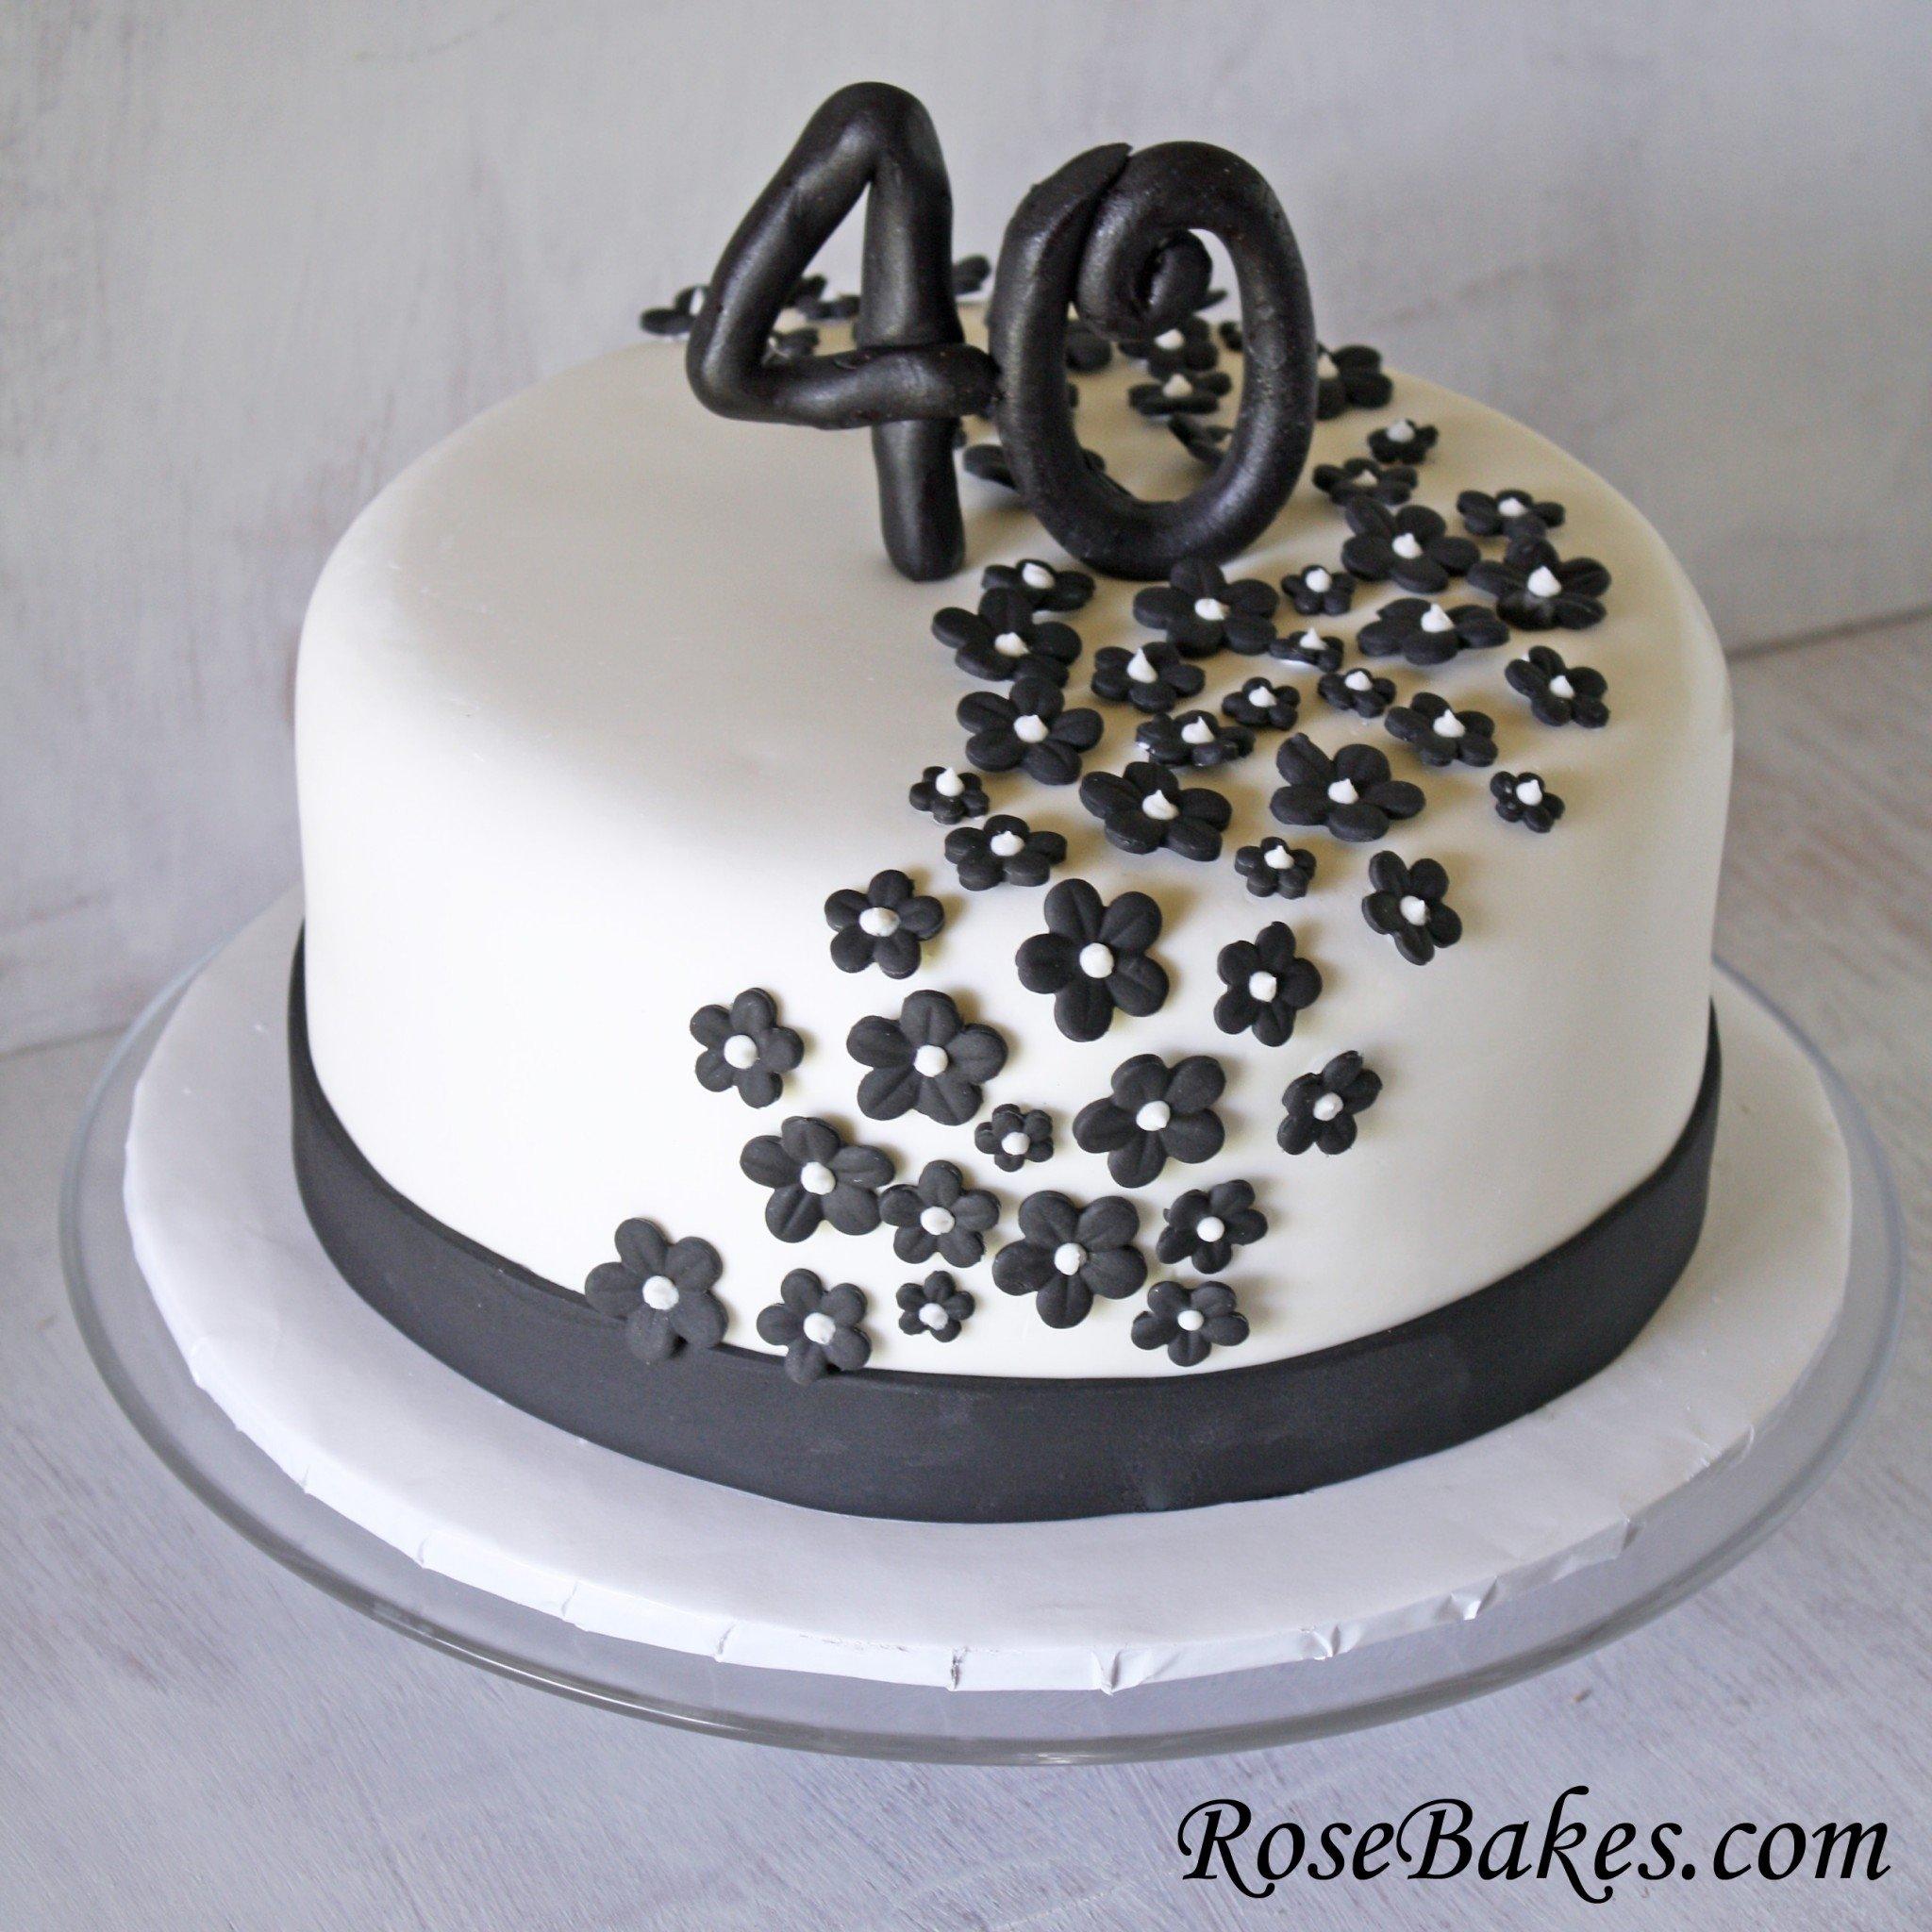 10 Stunning 40 Year Old Birthday Cake Ideas behance